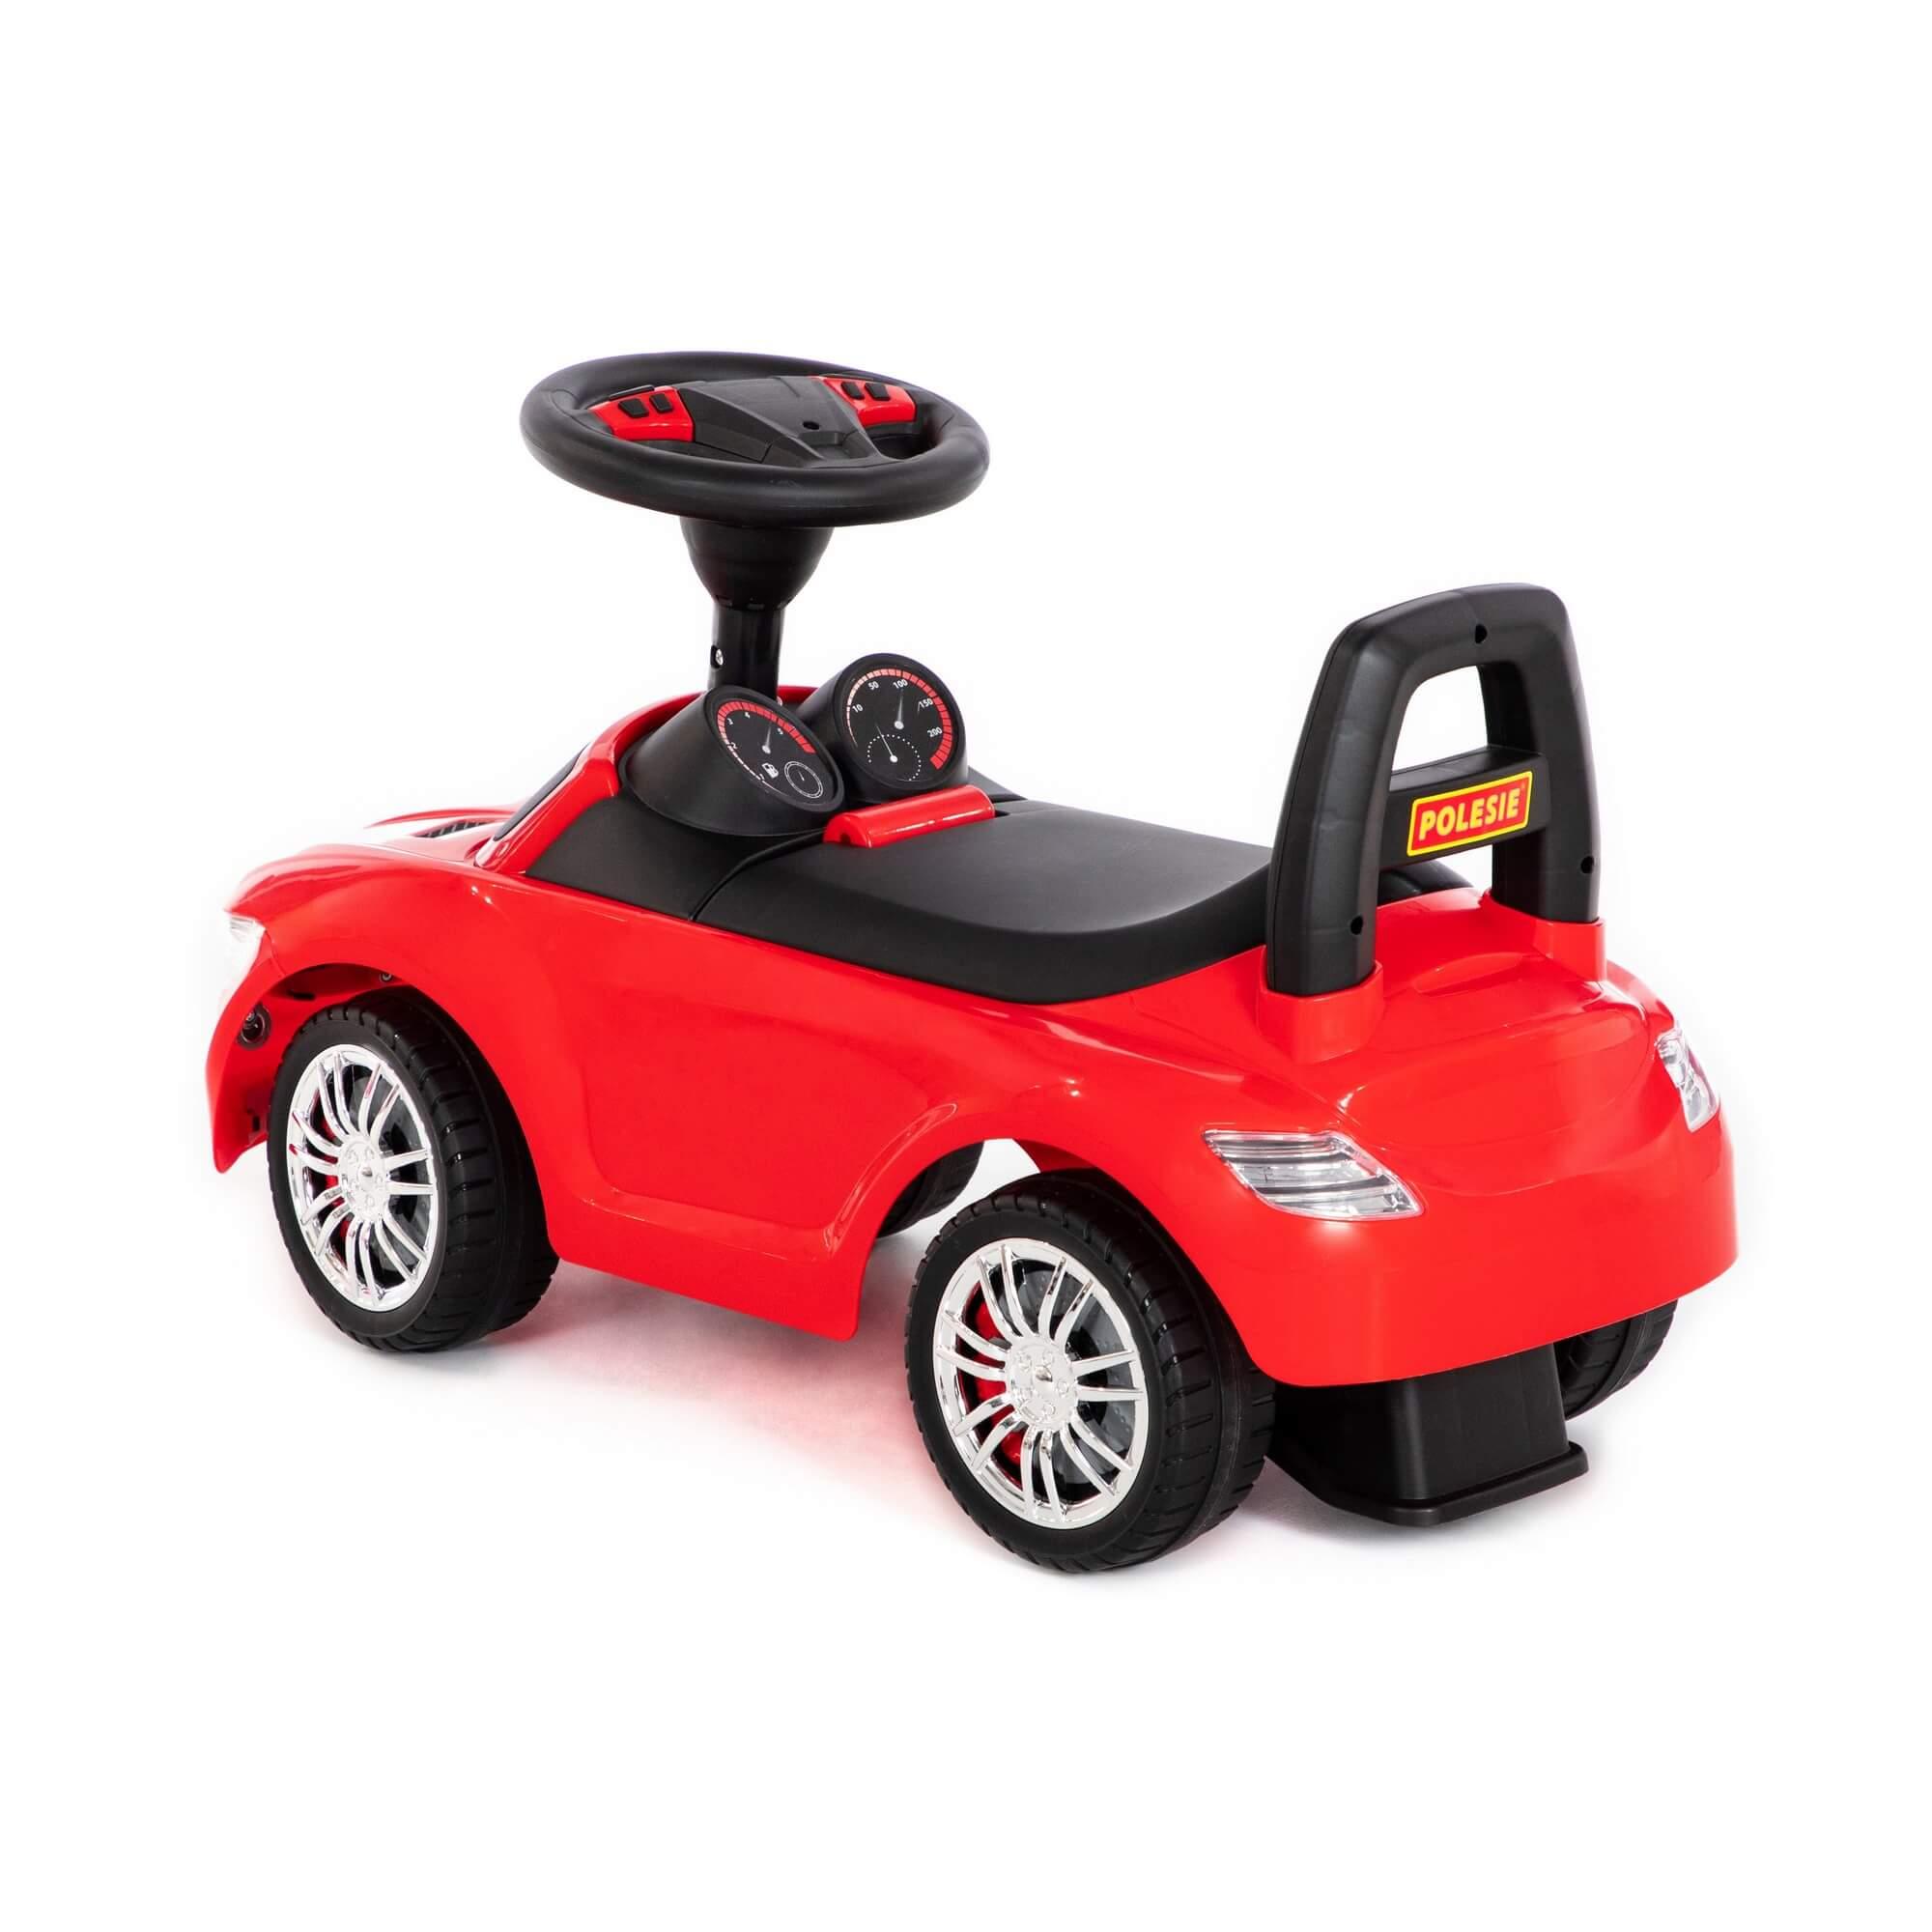 SuperCar sürümeli araba No:1 ses sinyali ile (pembe) Ref. 84460 - photo #3